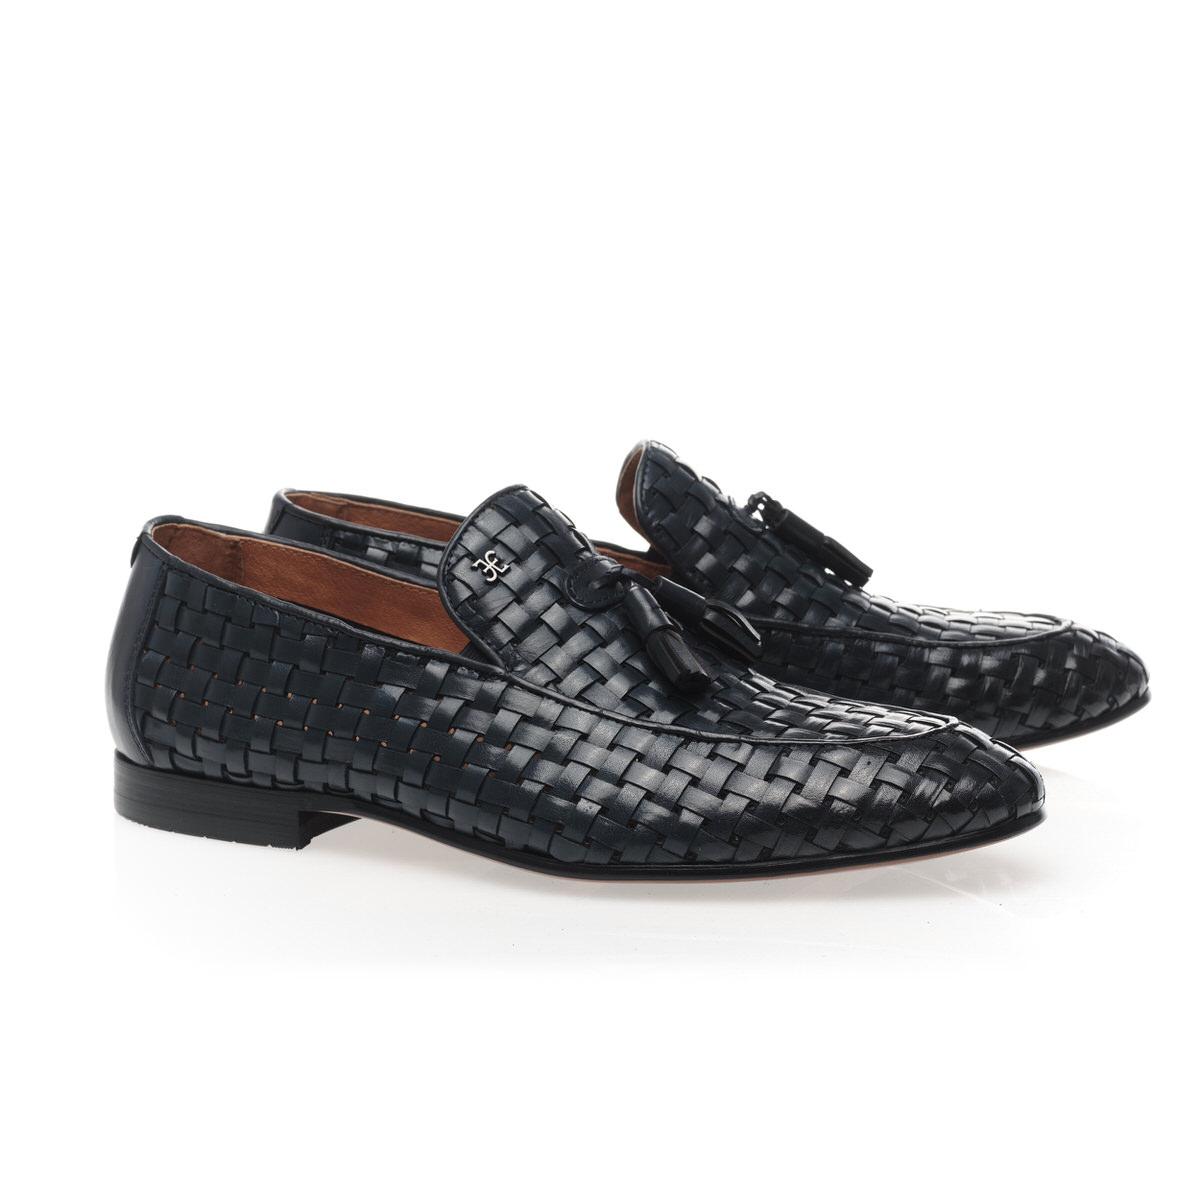 Fotografie produs site pantofi / geanta